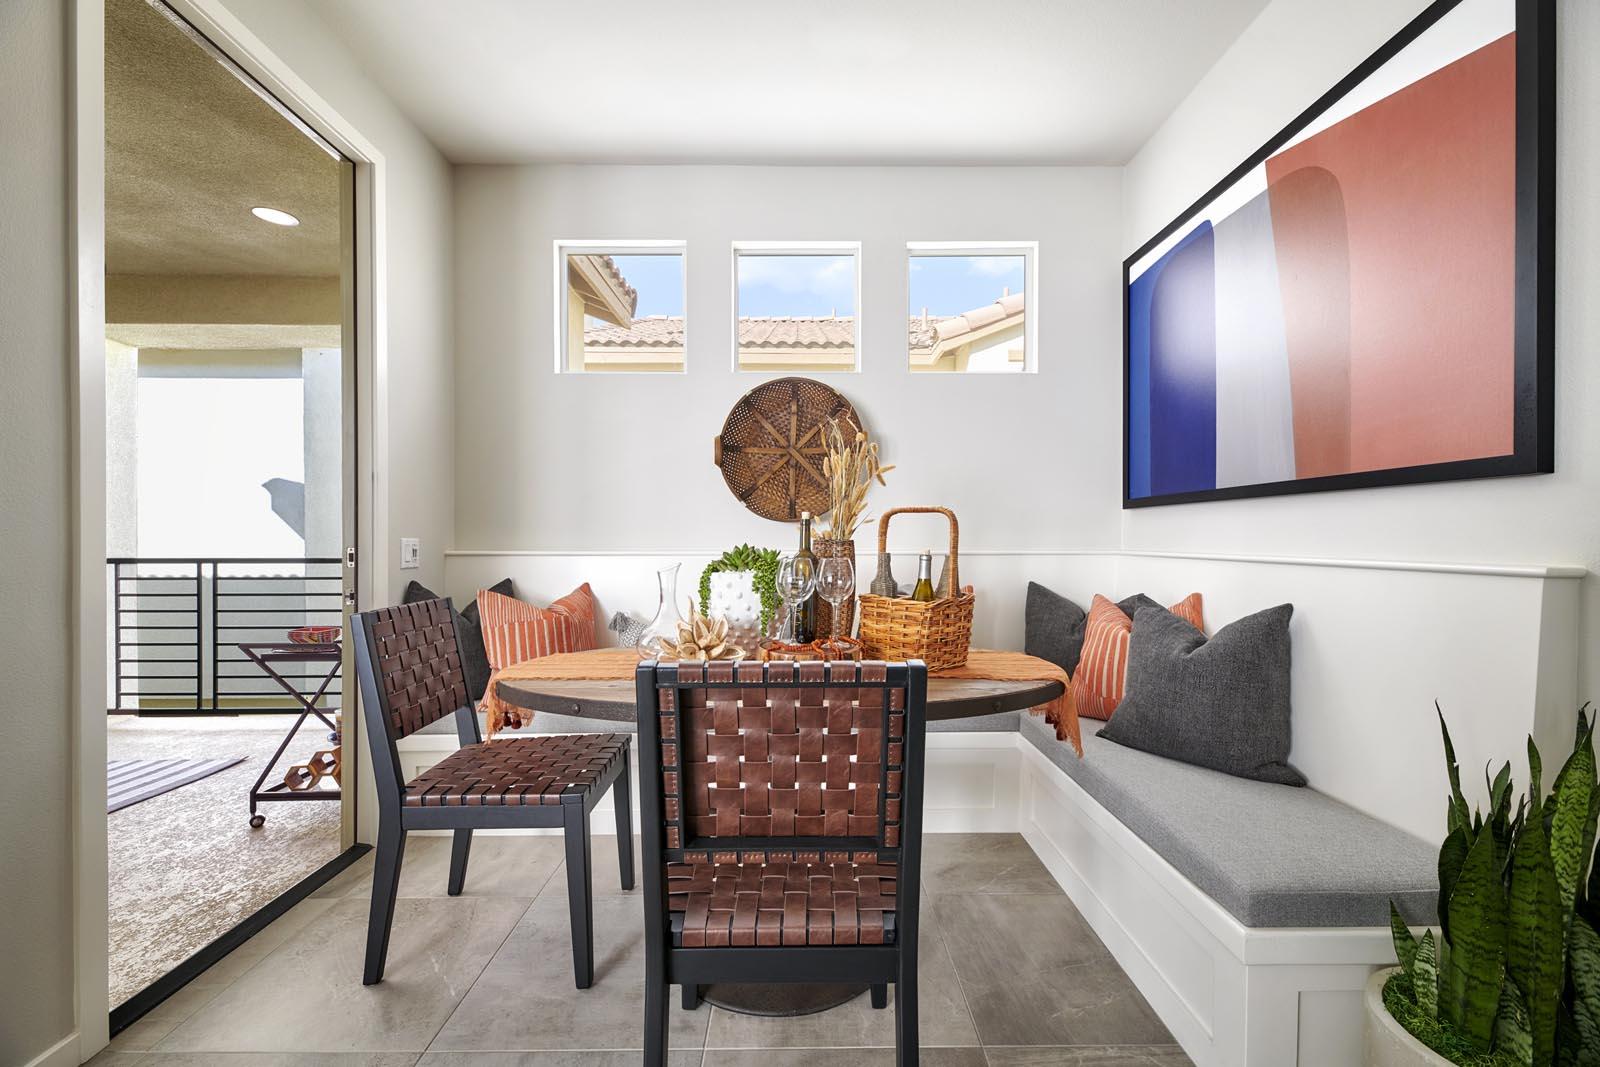 Dining Area | Residence 1 | Lumin | New Homes in Rancho Cucamonga, CA | Van Daele Homes